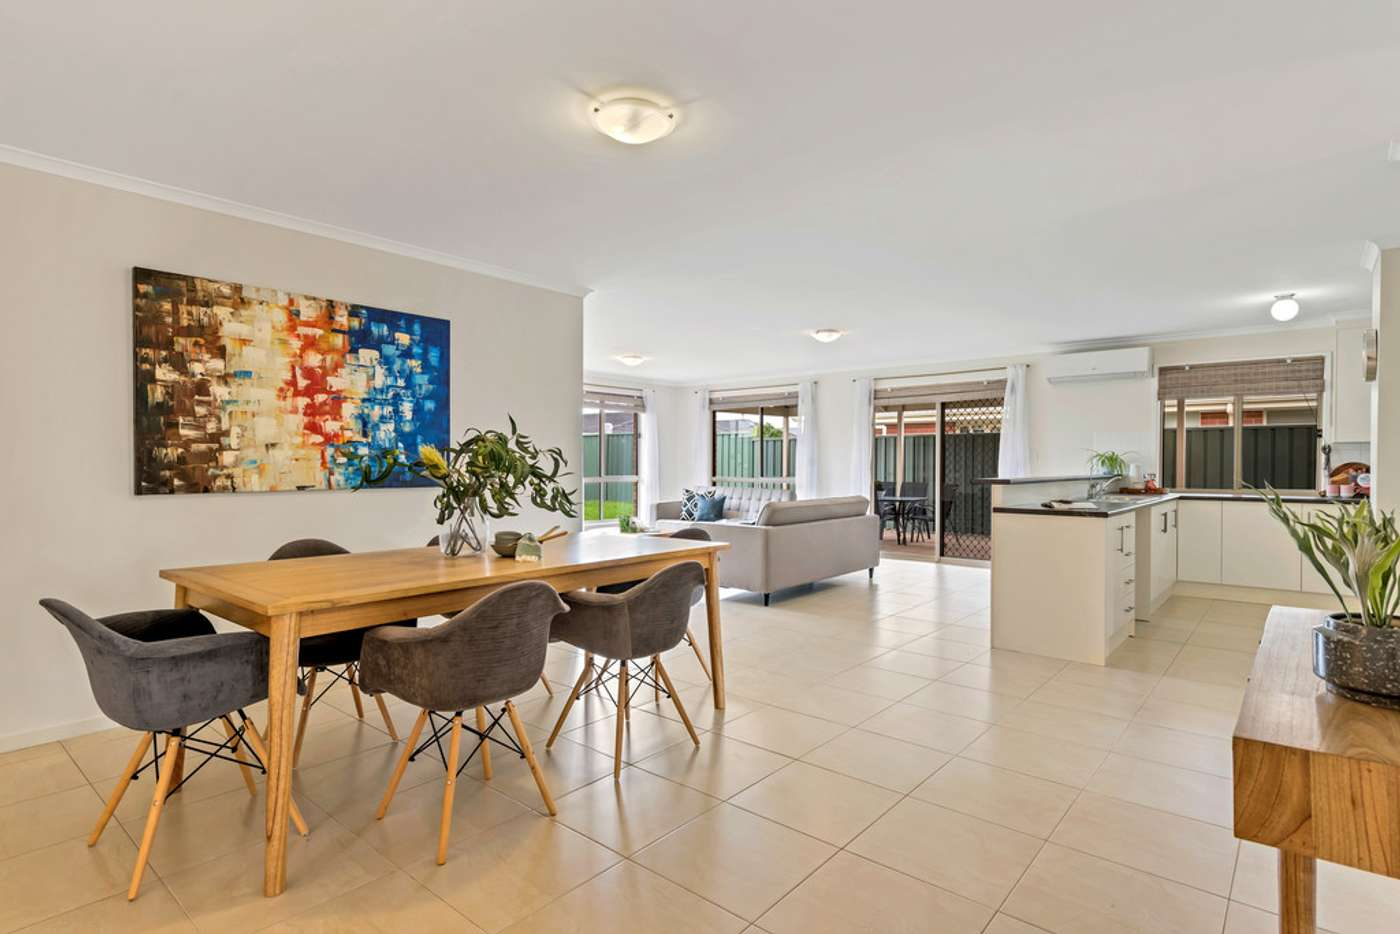 Main view of Homely house listing, 11 Tangerine Court, Aldinga Beach SA 5173